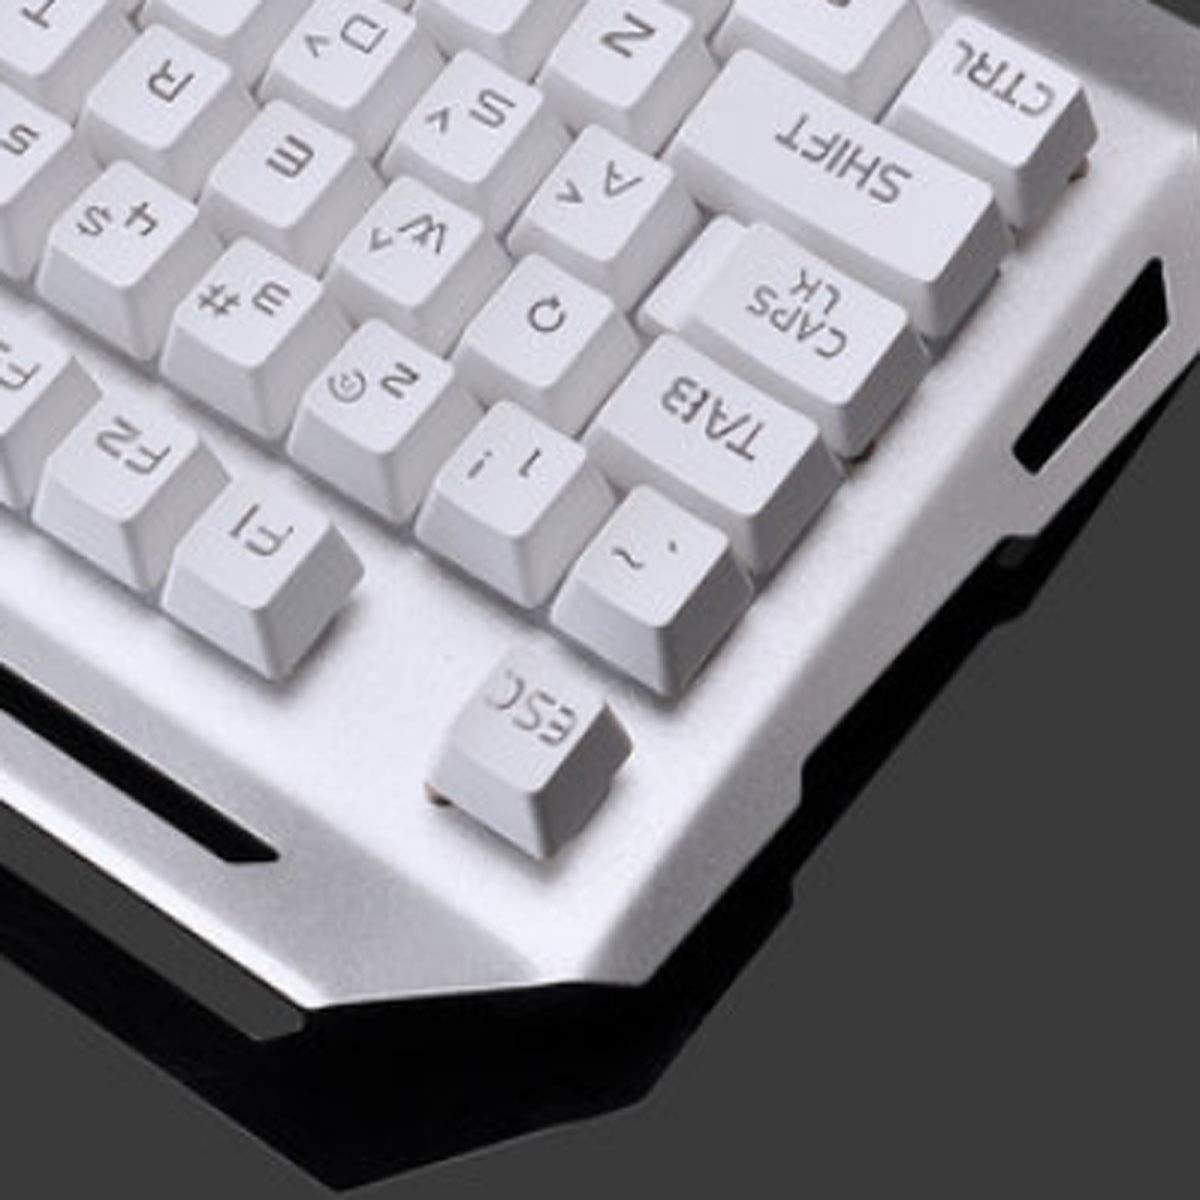 Esport Desktop Notebook Universal Style Mechanical Touch Set Computer Keyboard Wuhuizhenjingxiaobu Keyboard Black Orange Light, Mouse Pad + Mouse, 45.616.84.3cm Delicate